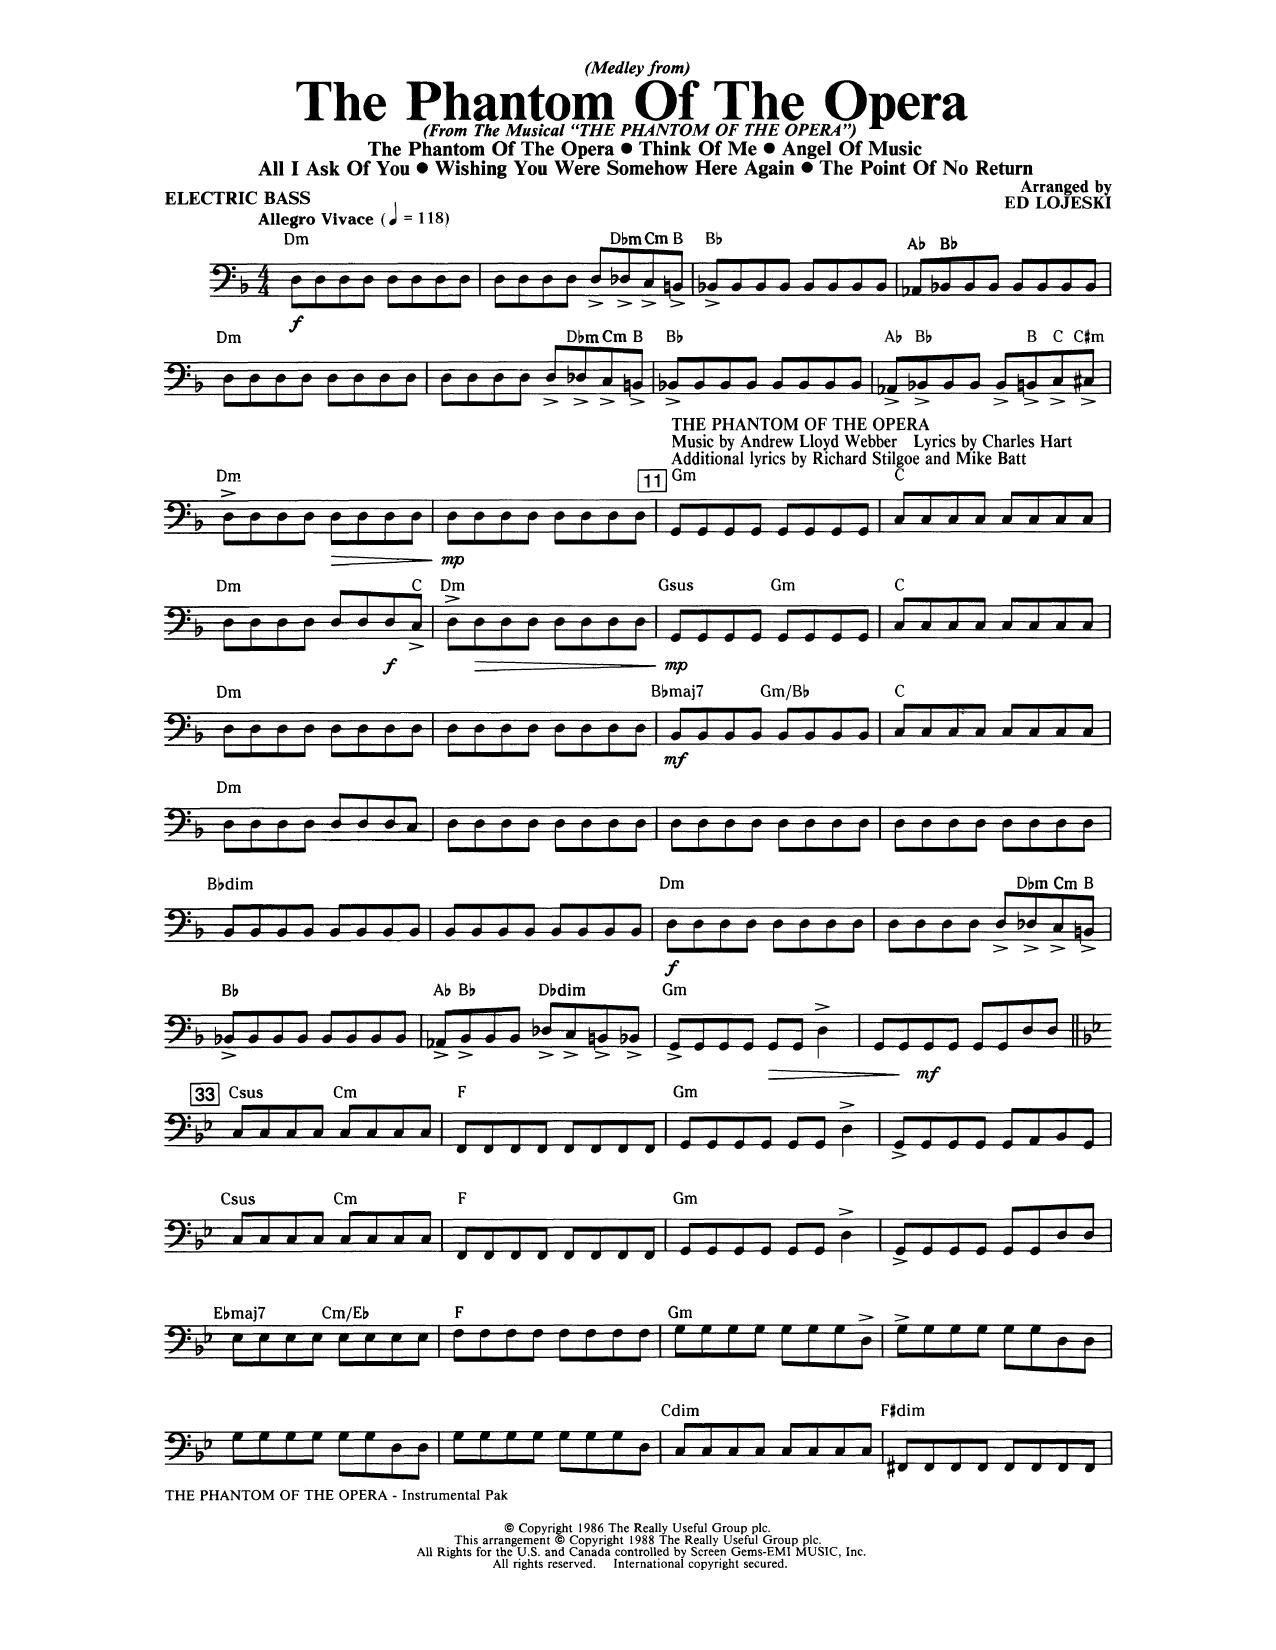 The Phantom Of The Opera (Medley) (arr. Ed Lojeski) - Electric Bass Sheet Music